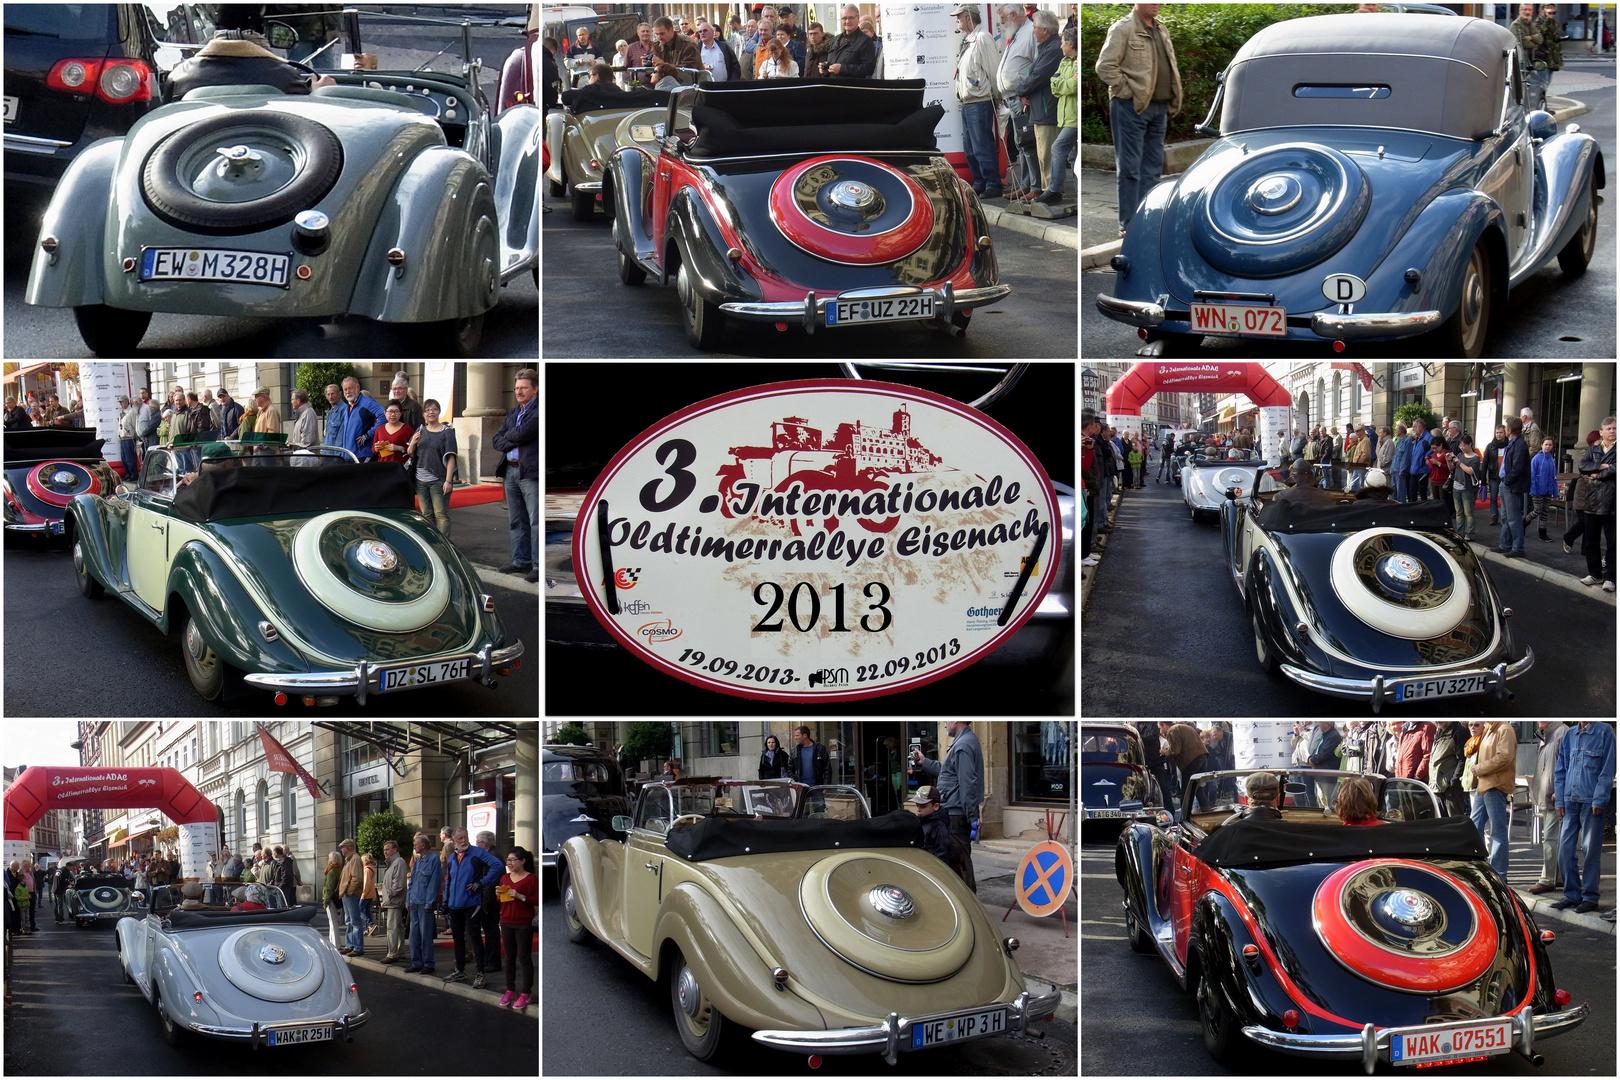 3. Oldtimer-Rallye in Eisenach 2013